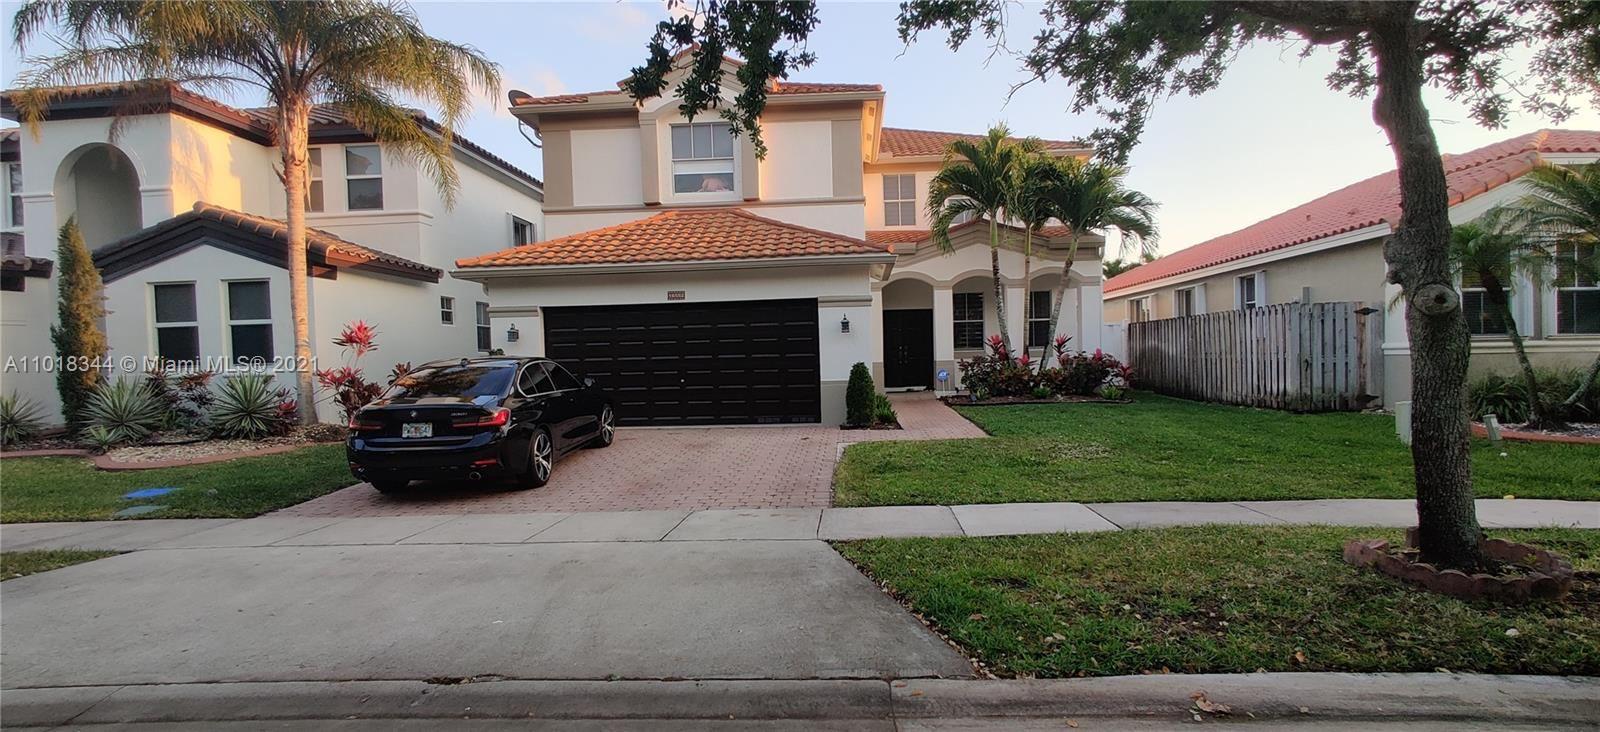 16552 SW 39th St, Miramar, FL 33027 - #: A11018344